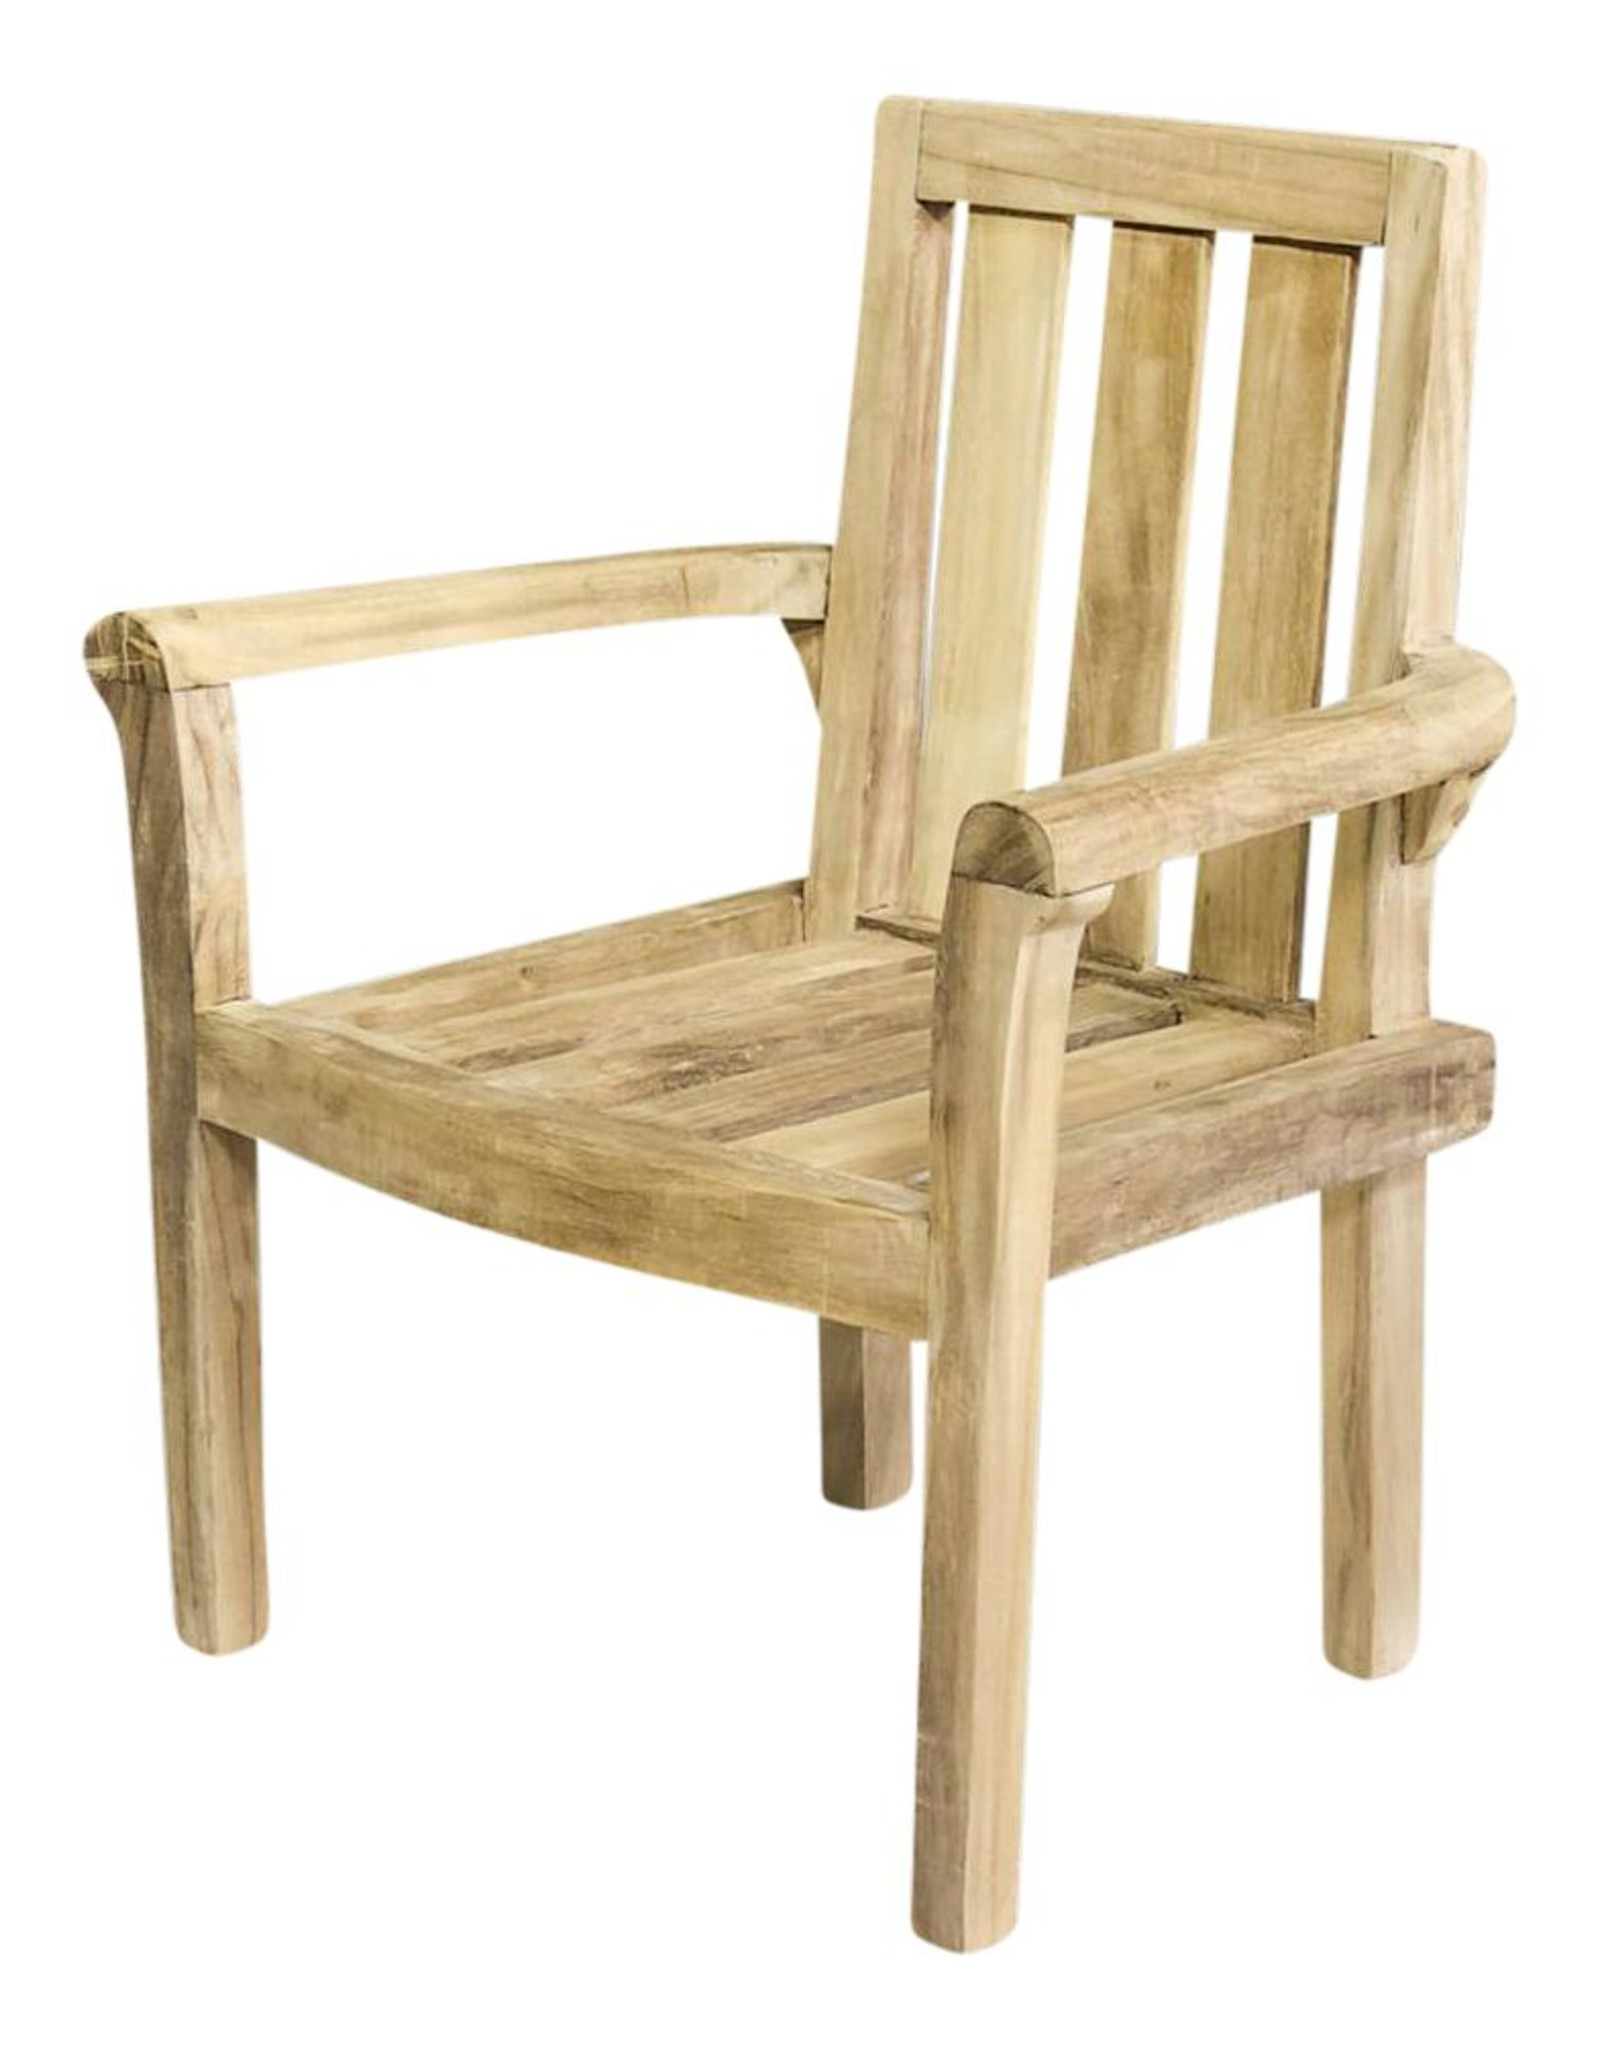 Junior stapelstoel